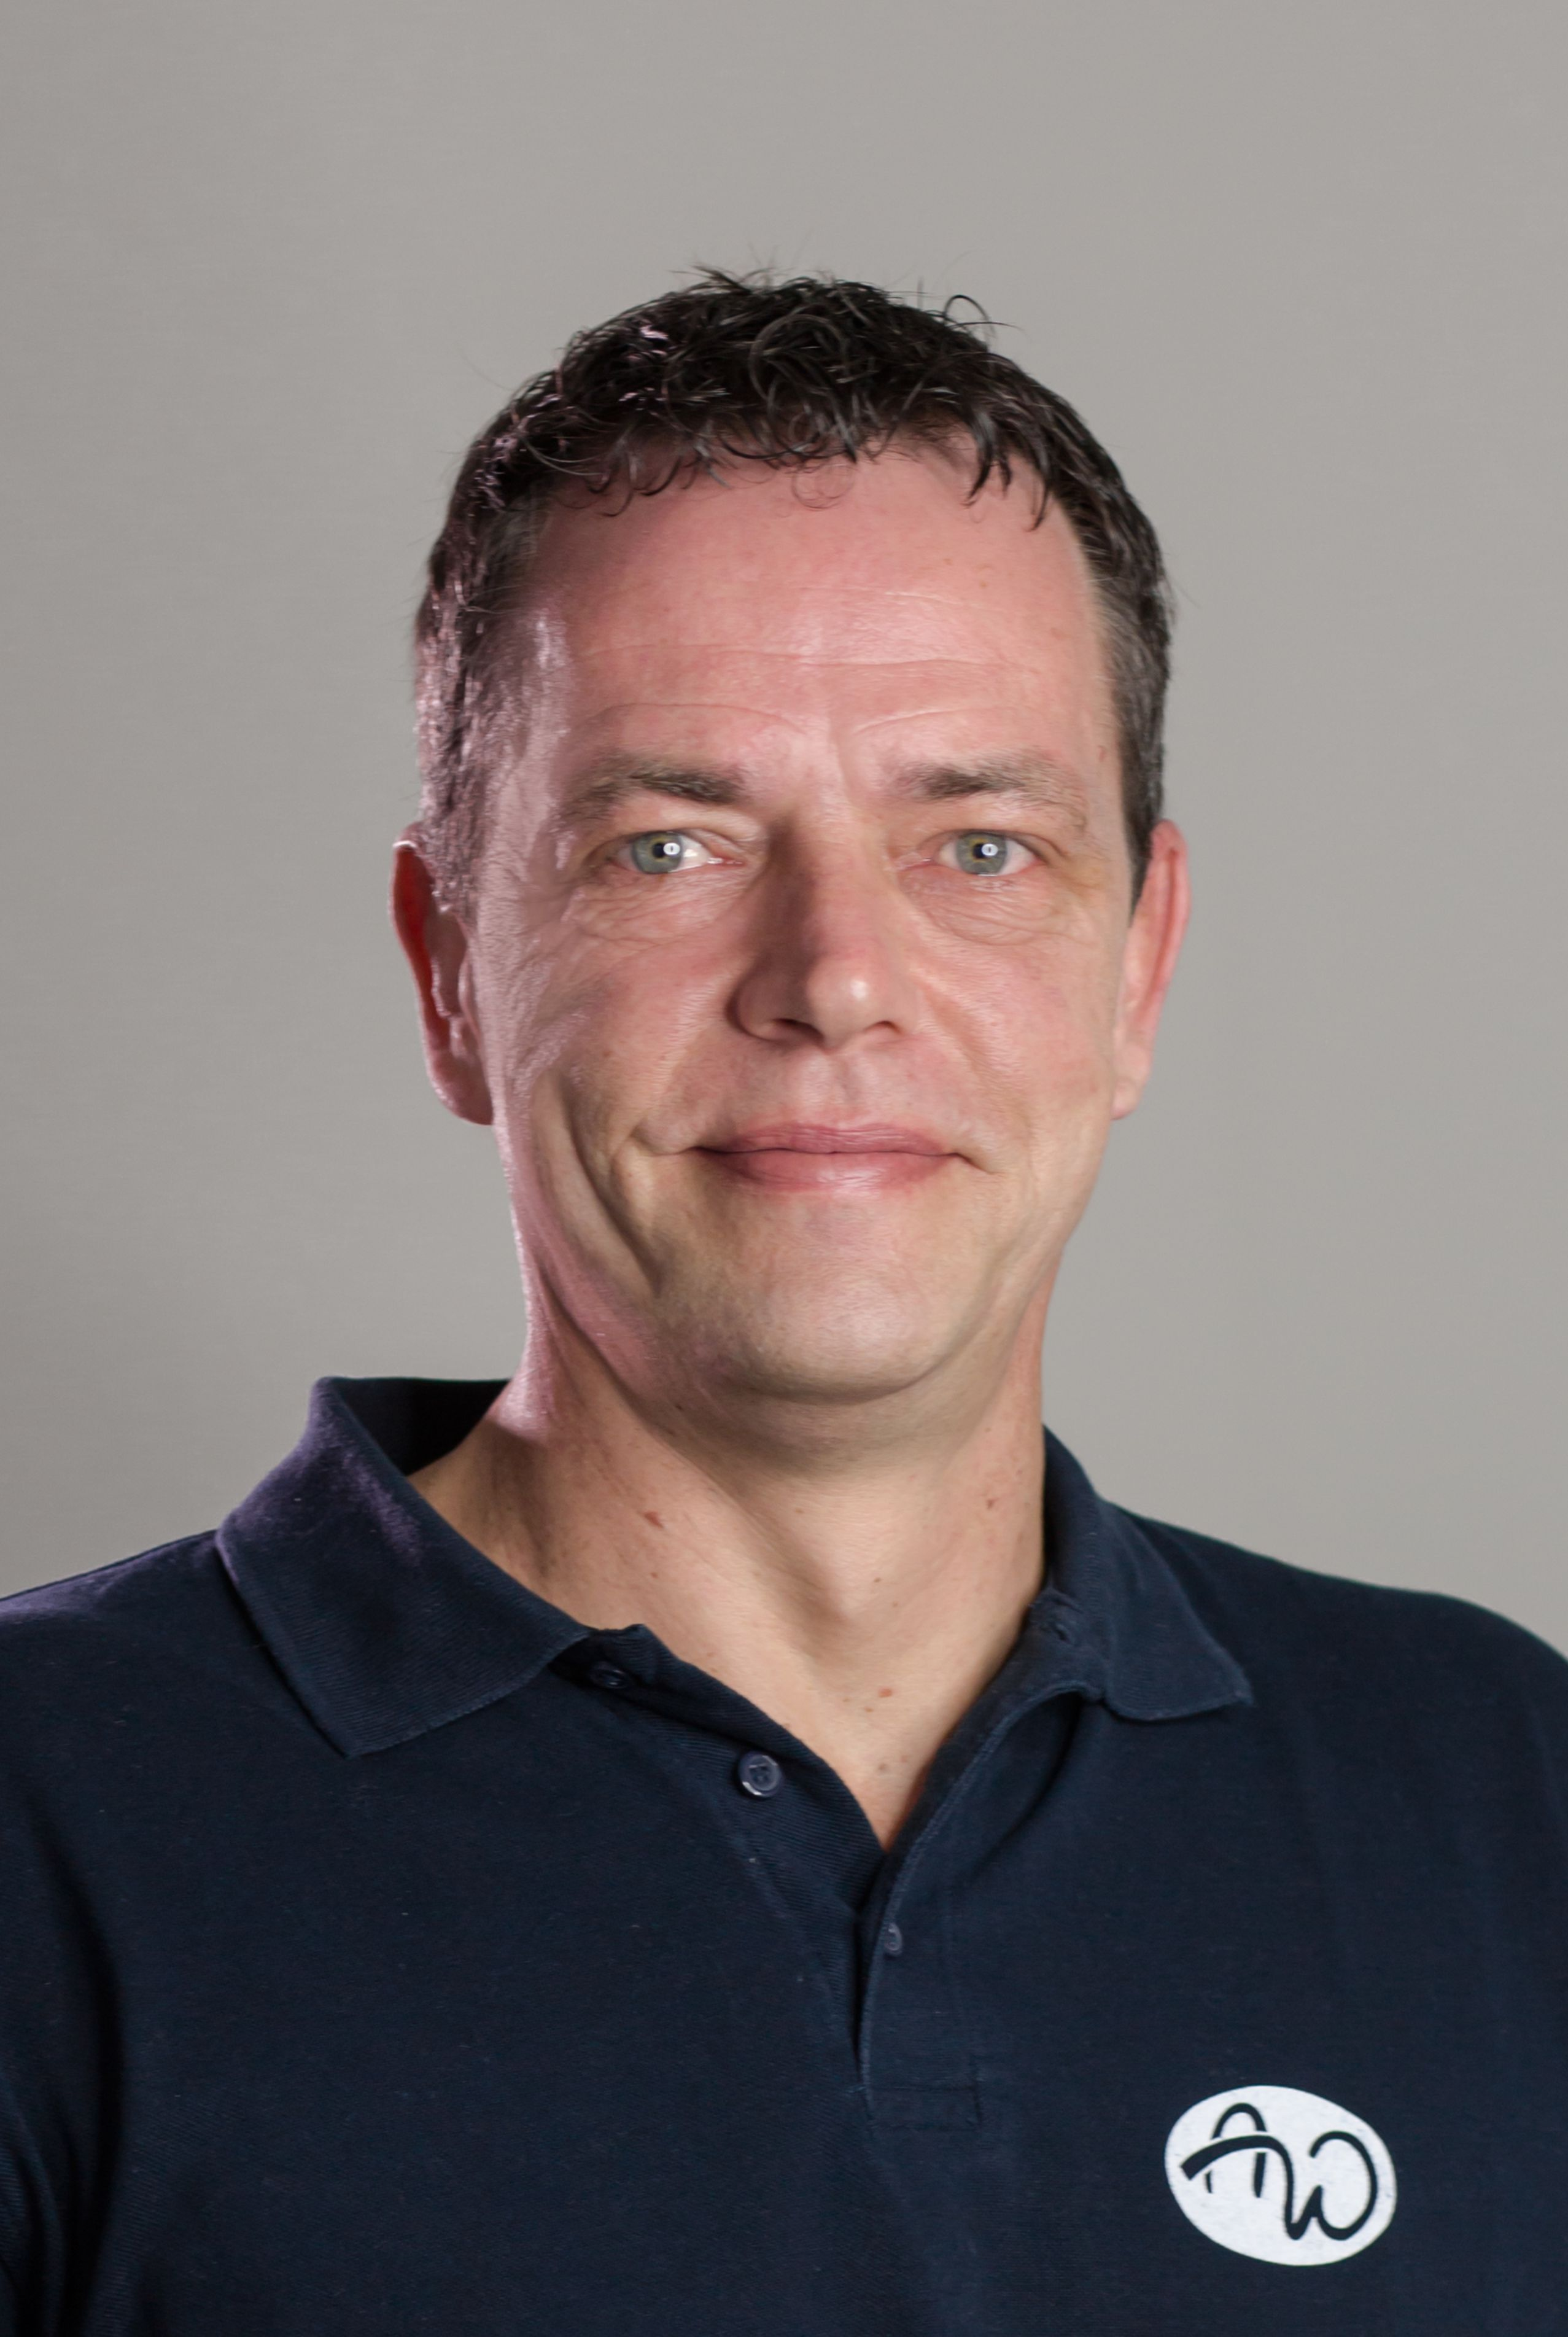 André Wenzel